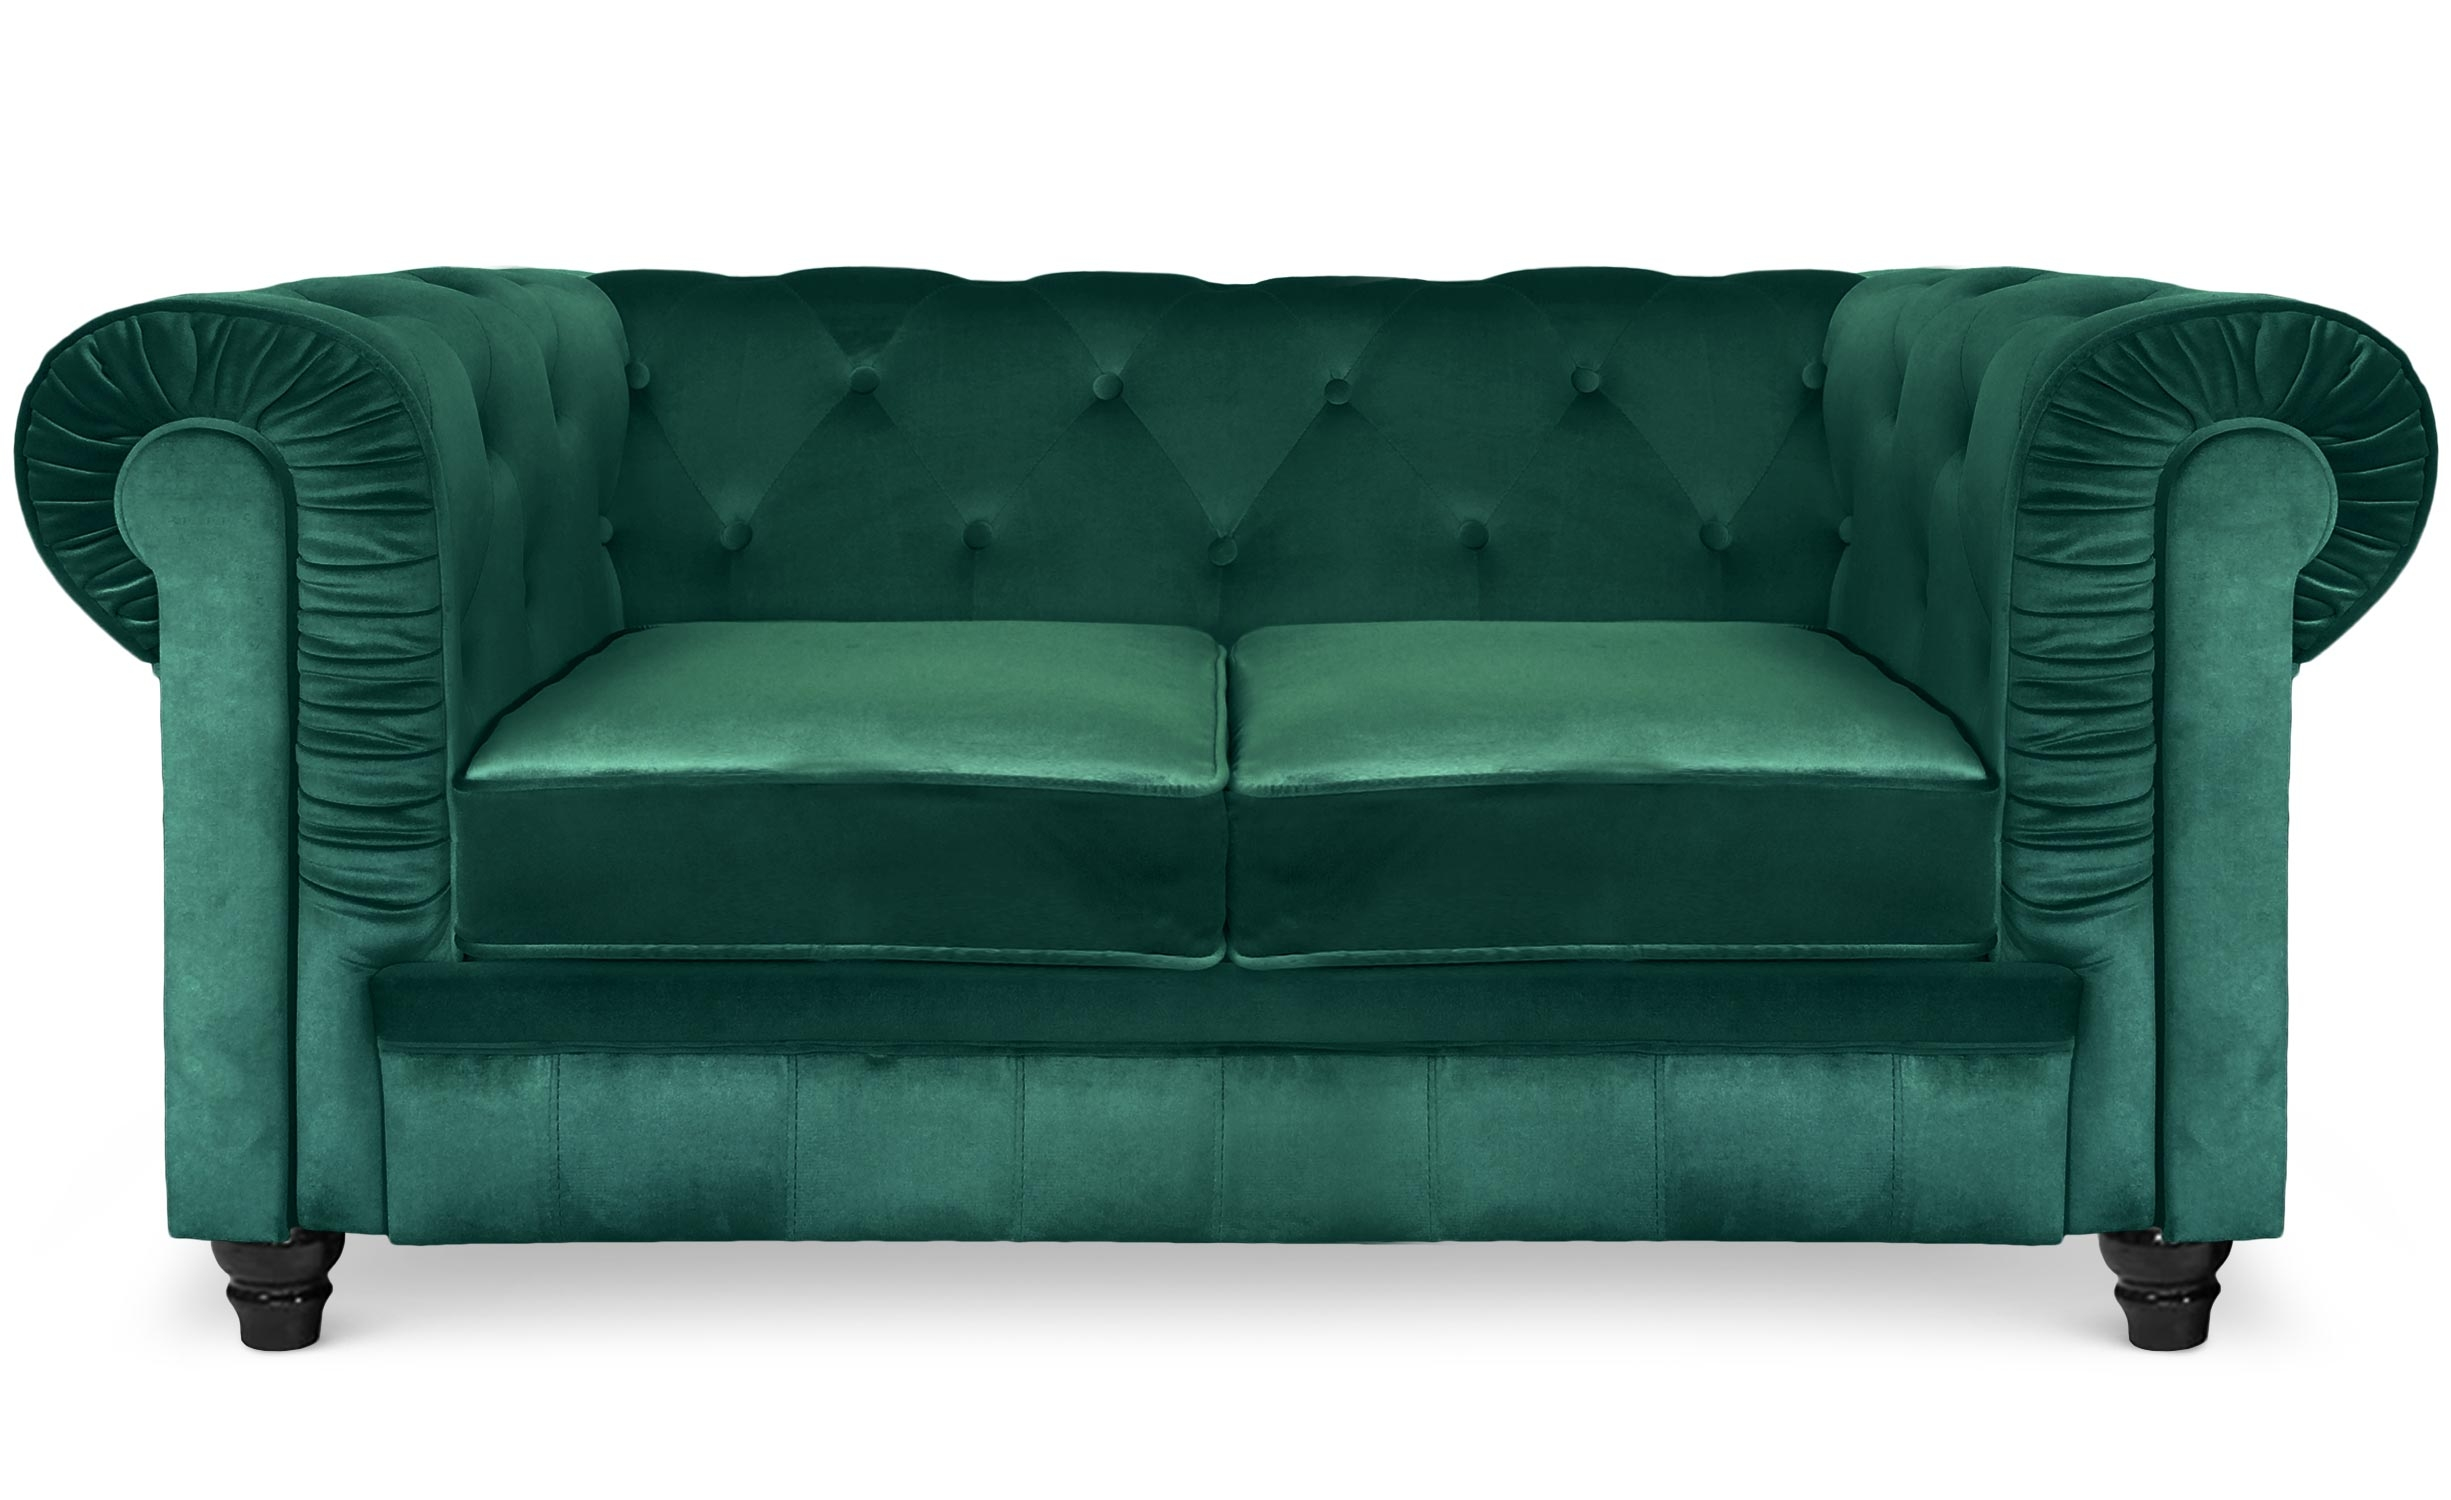 Grand Canapé Chesterfield 2-Sitzer Sofa mit Samtbezug Grün